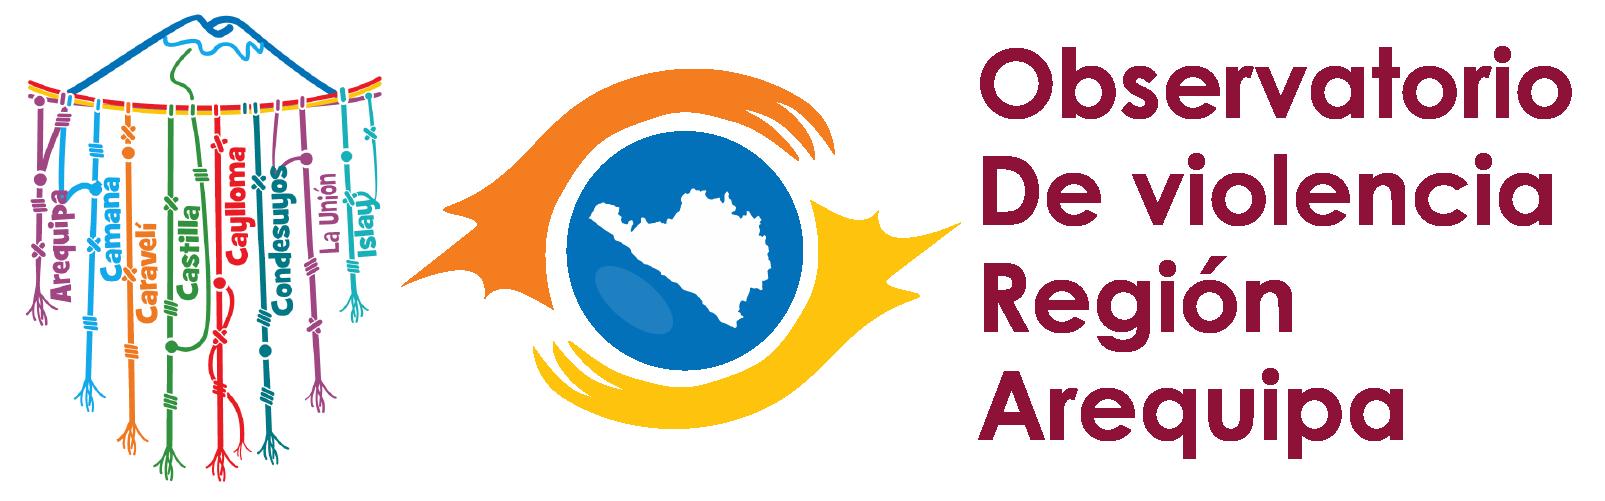 Observatorio Violencia Regional Arequipa